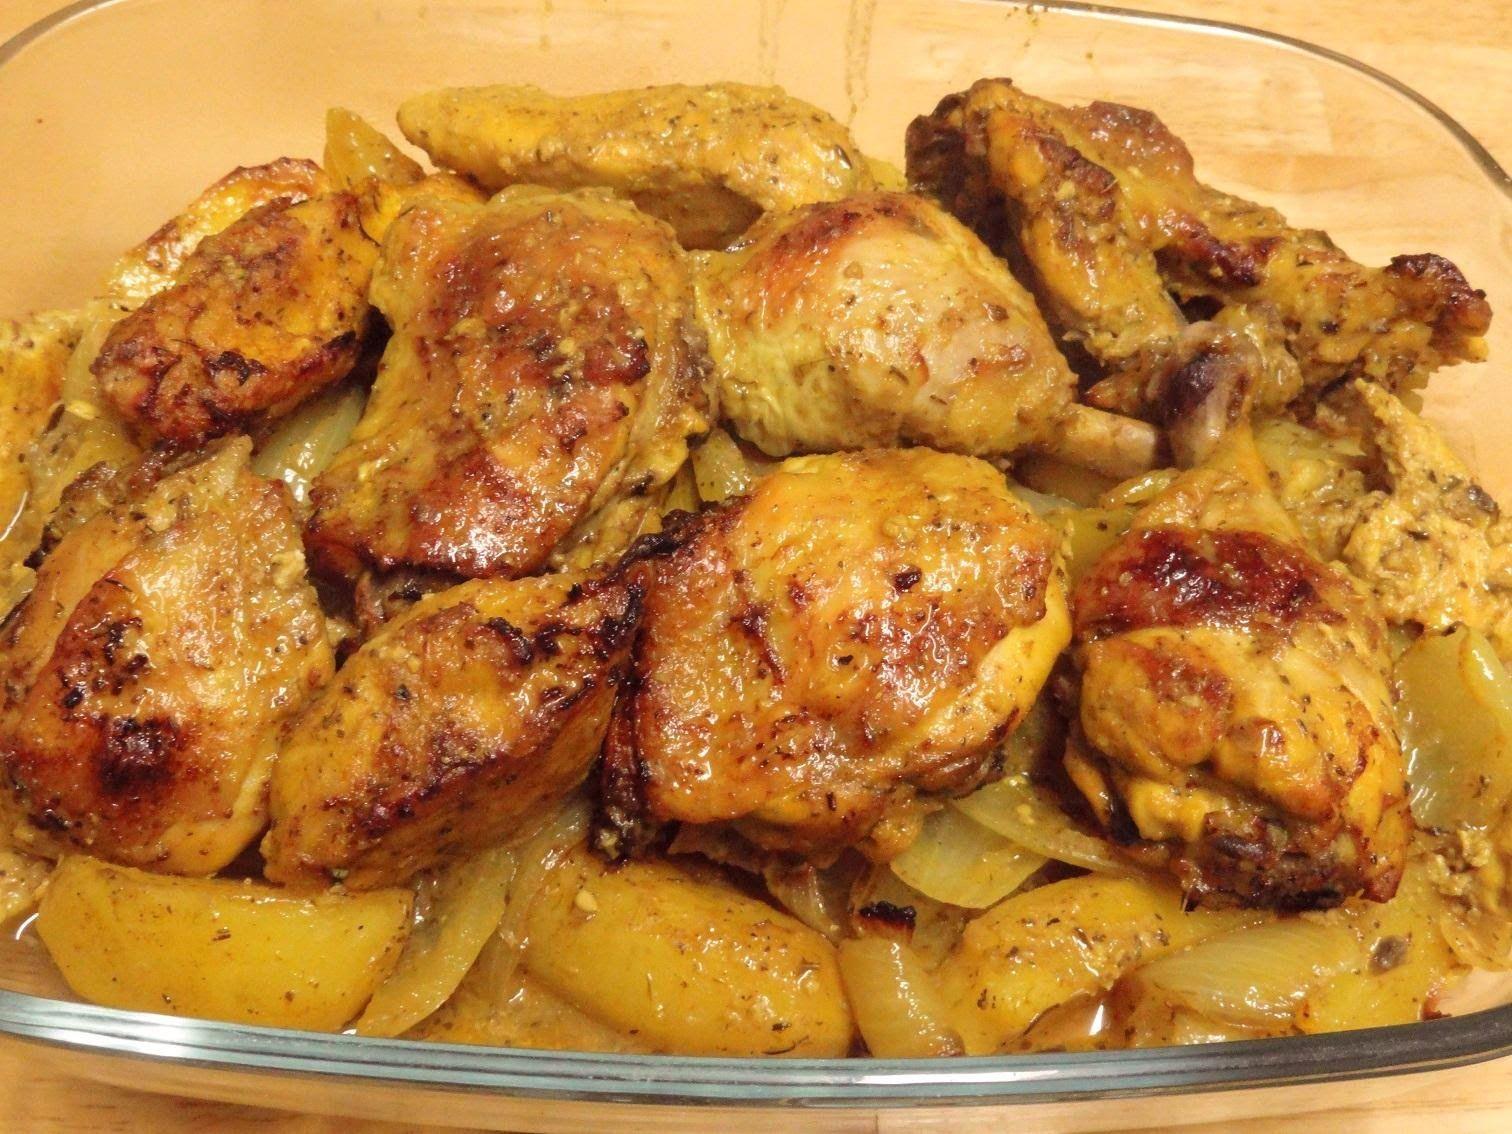 تبسي الدجاج أكلات عراقية Iraqi Food Middle Eastern Recipes Mediterranean Recipes Eastern Cuisine